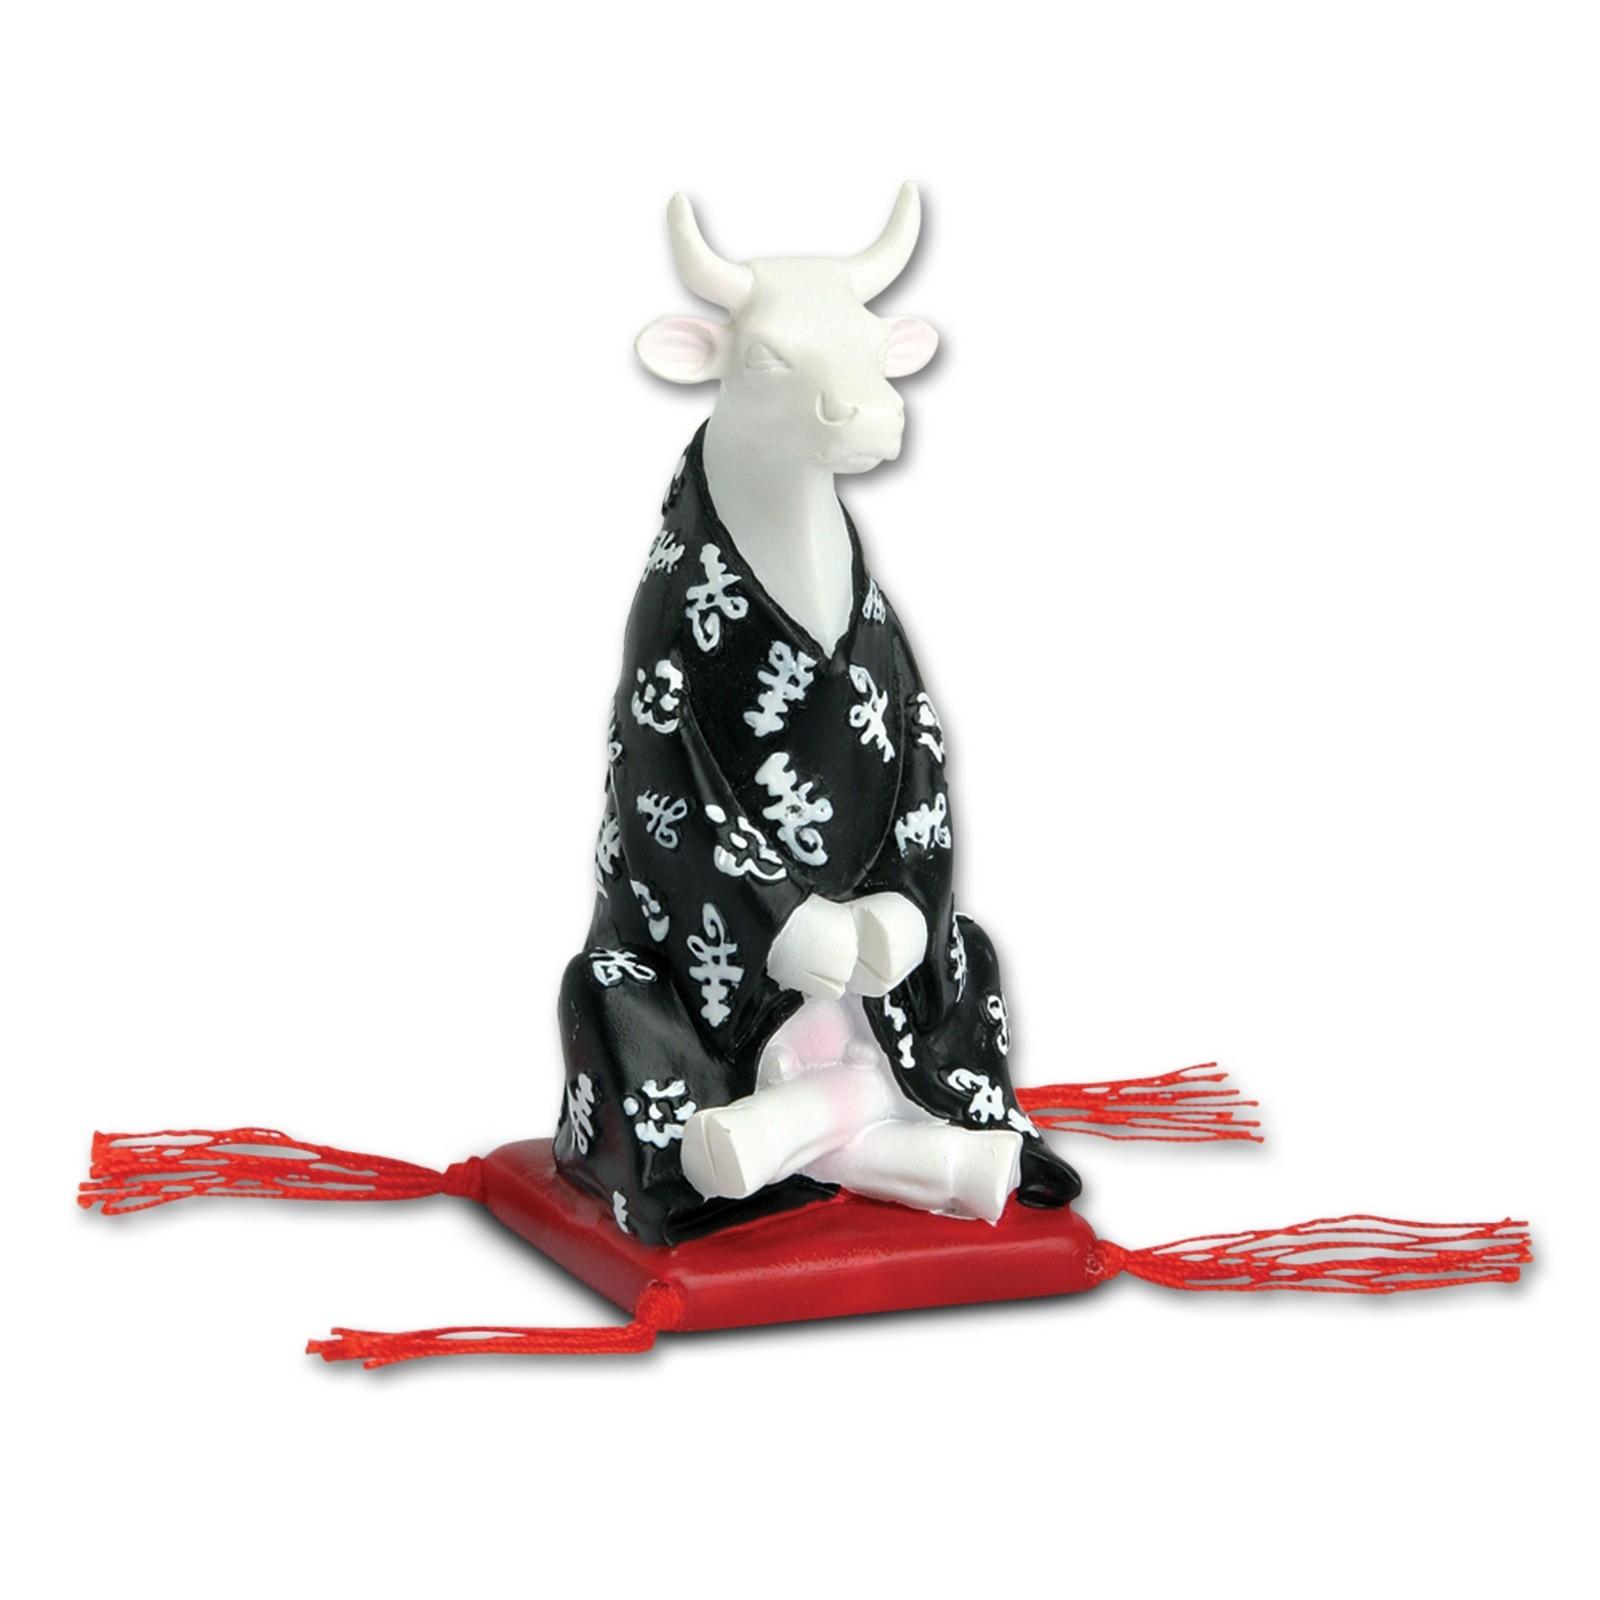 Meditierende Design Kuh mit Kimono 4,5cm Köthen Kuhparade KOS003